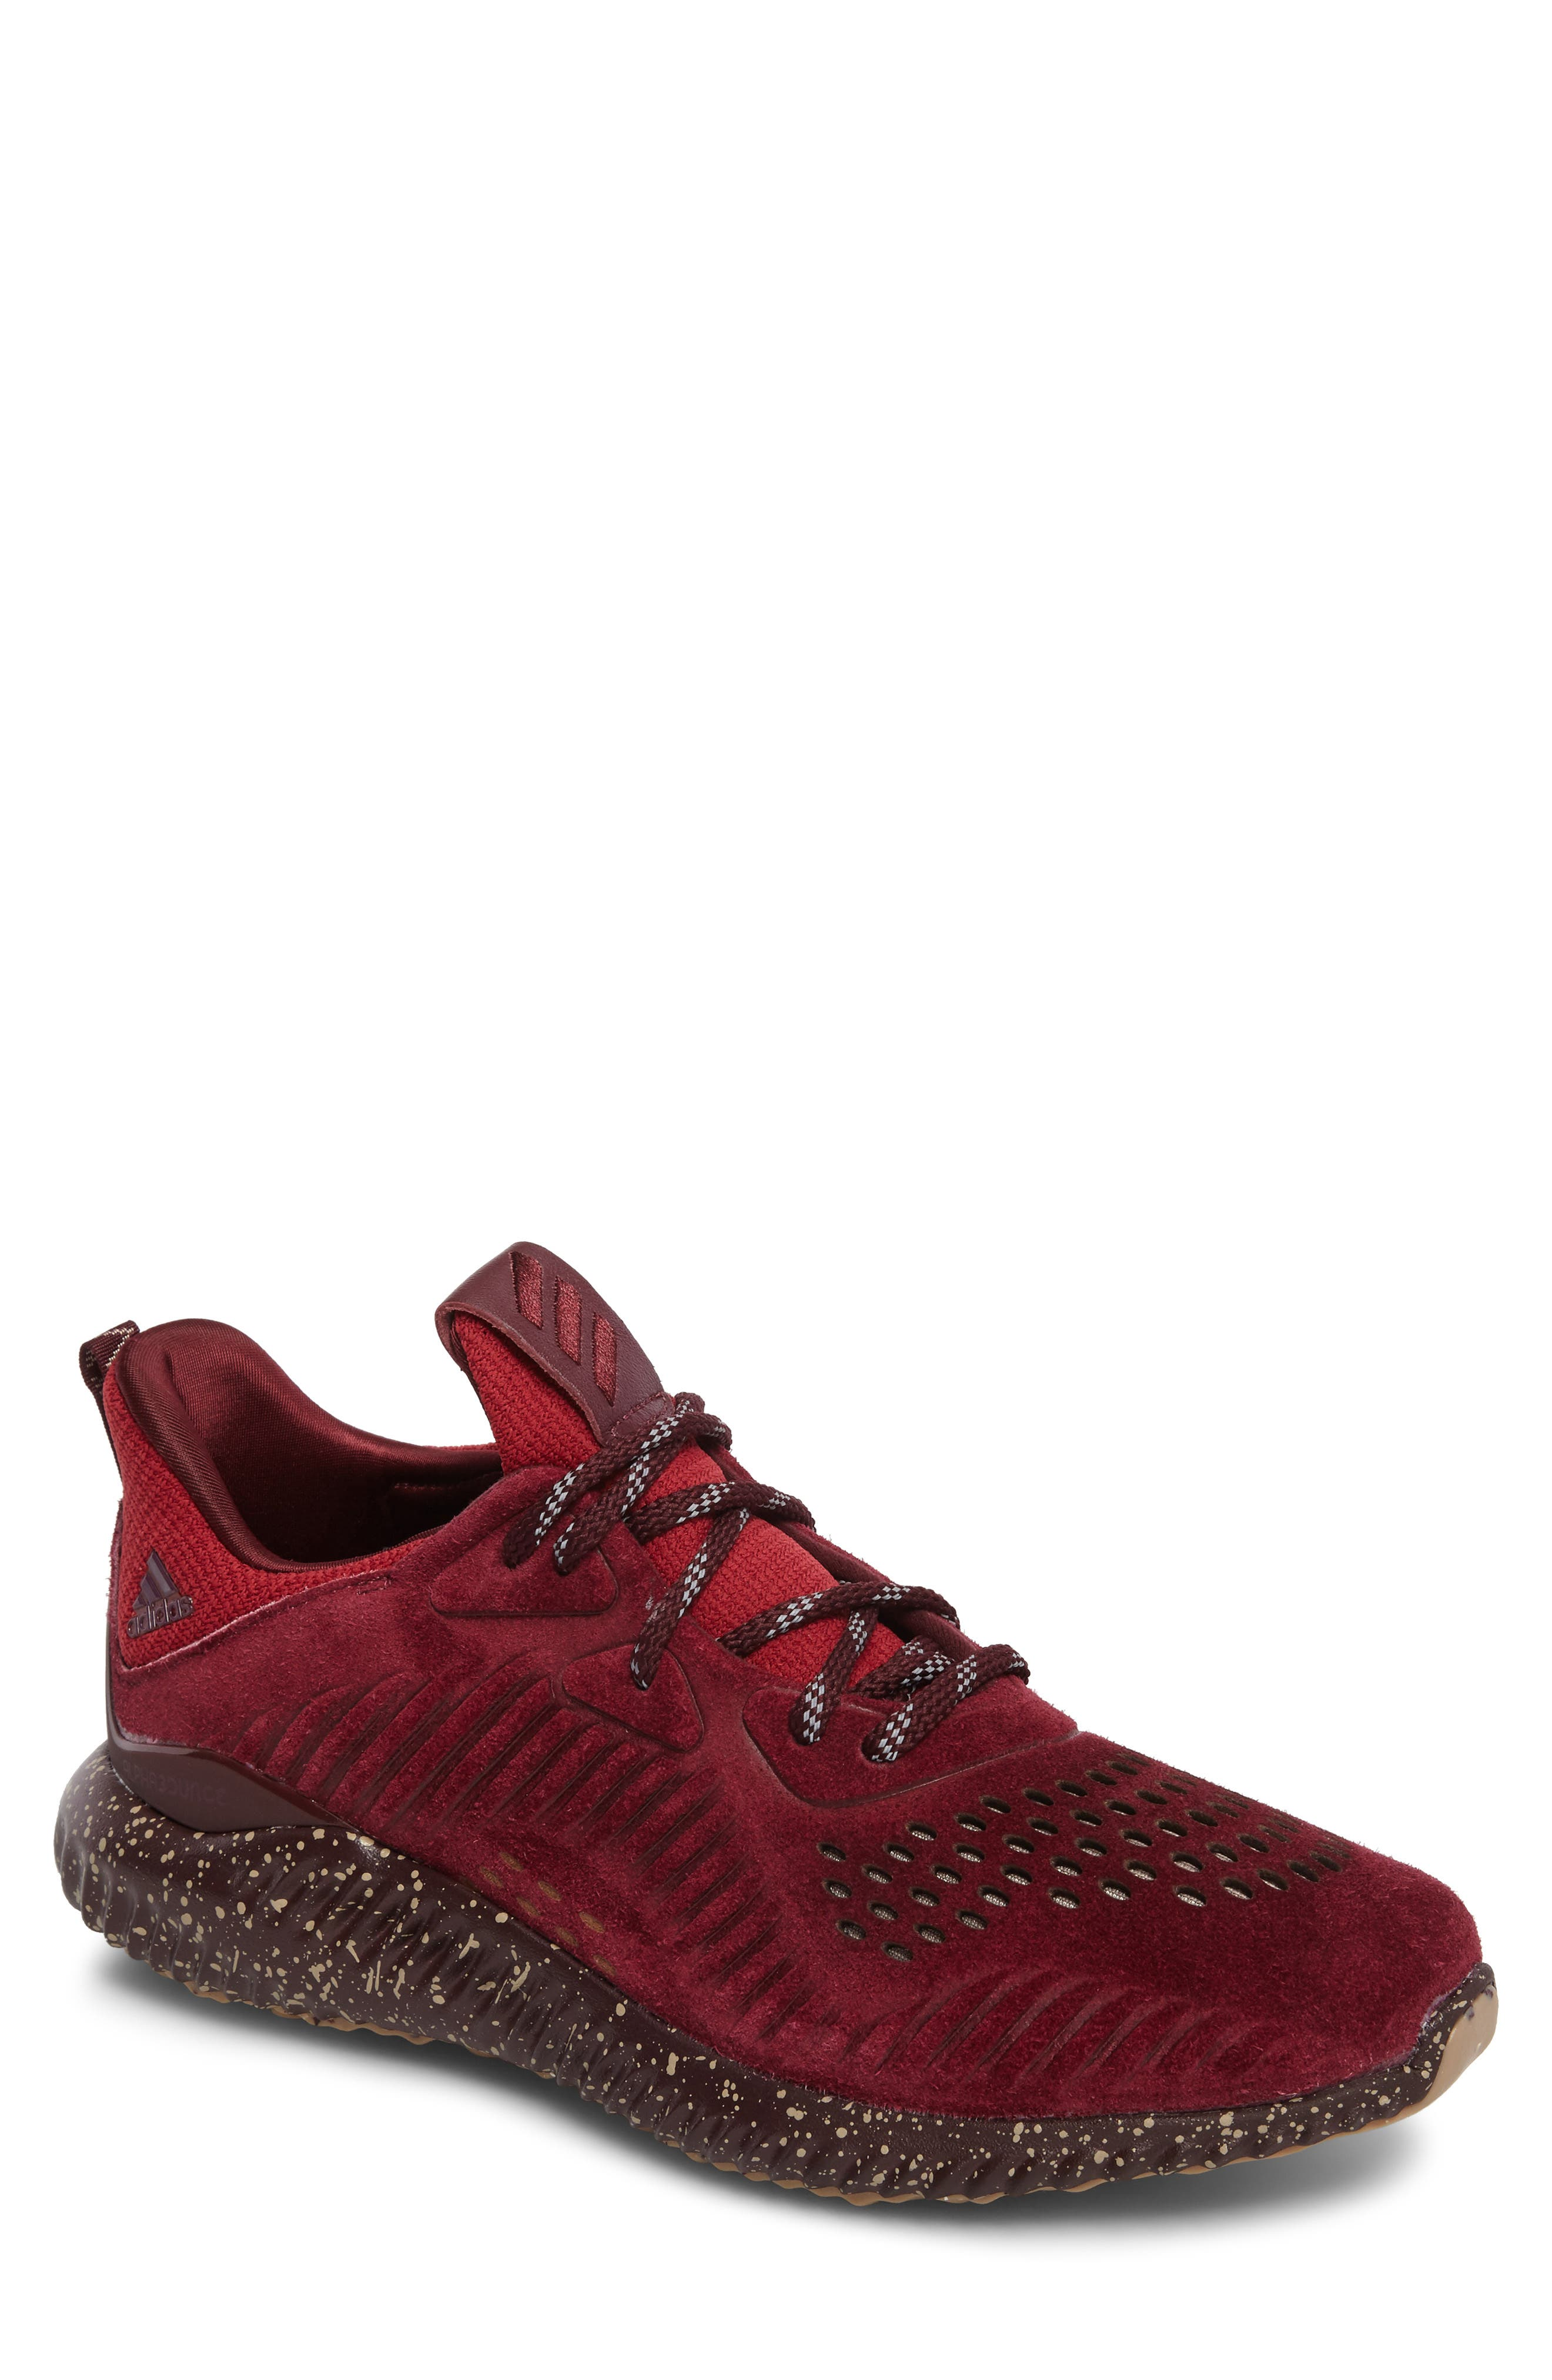 Alternate Image 1 Selected - adidas AlphaBounce LEA Running Shoe (Men)